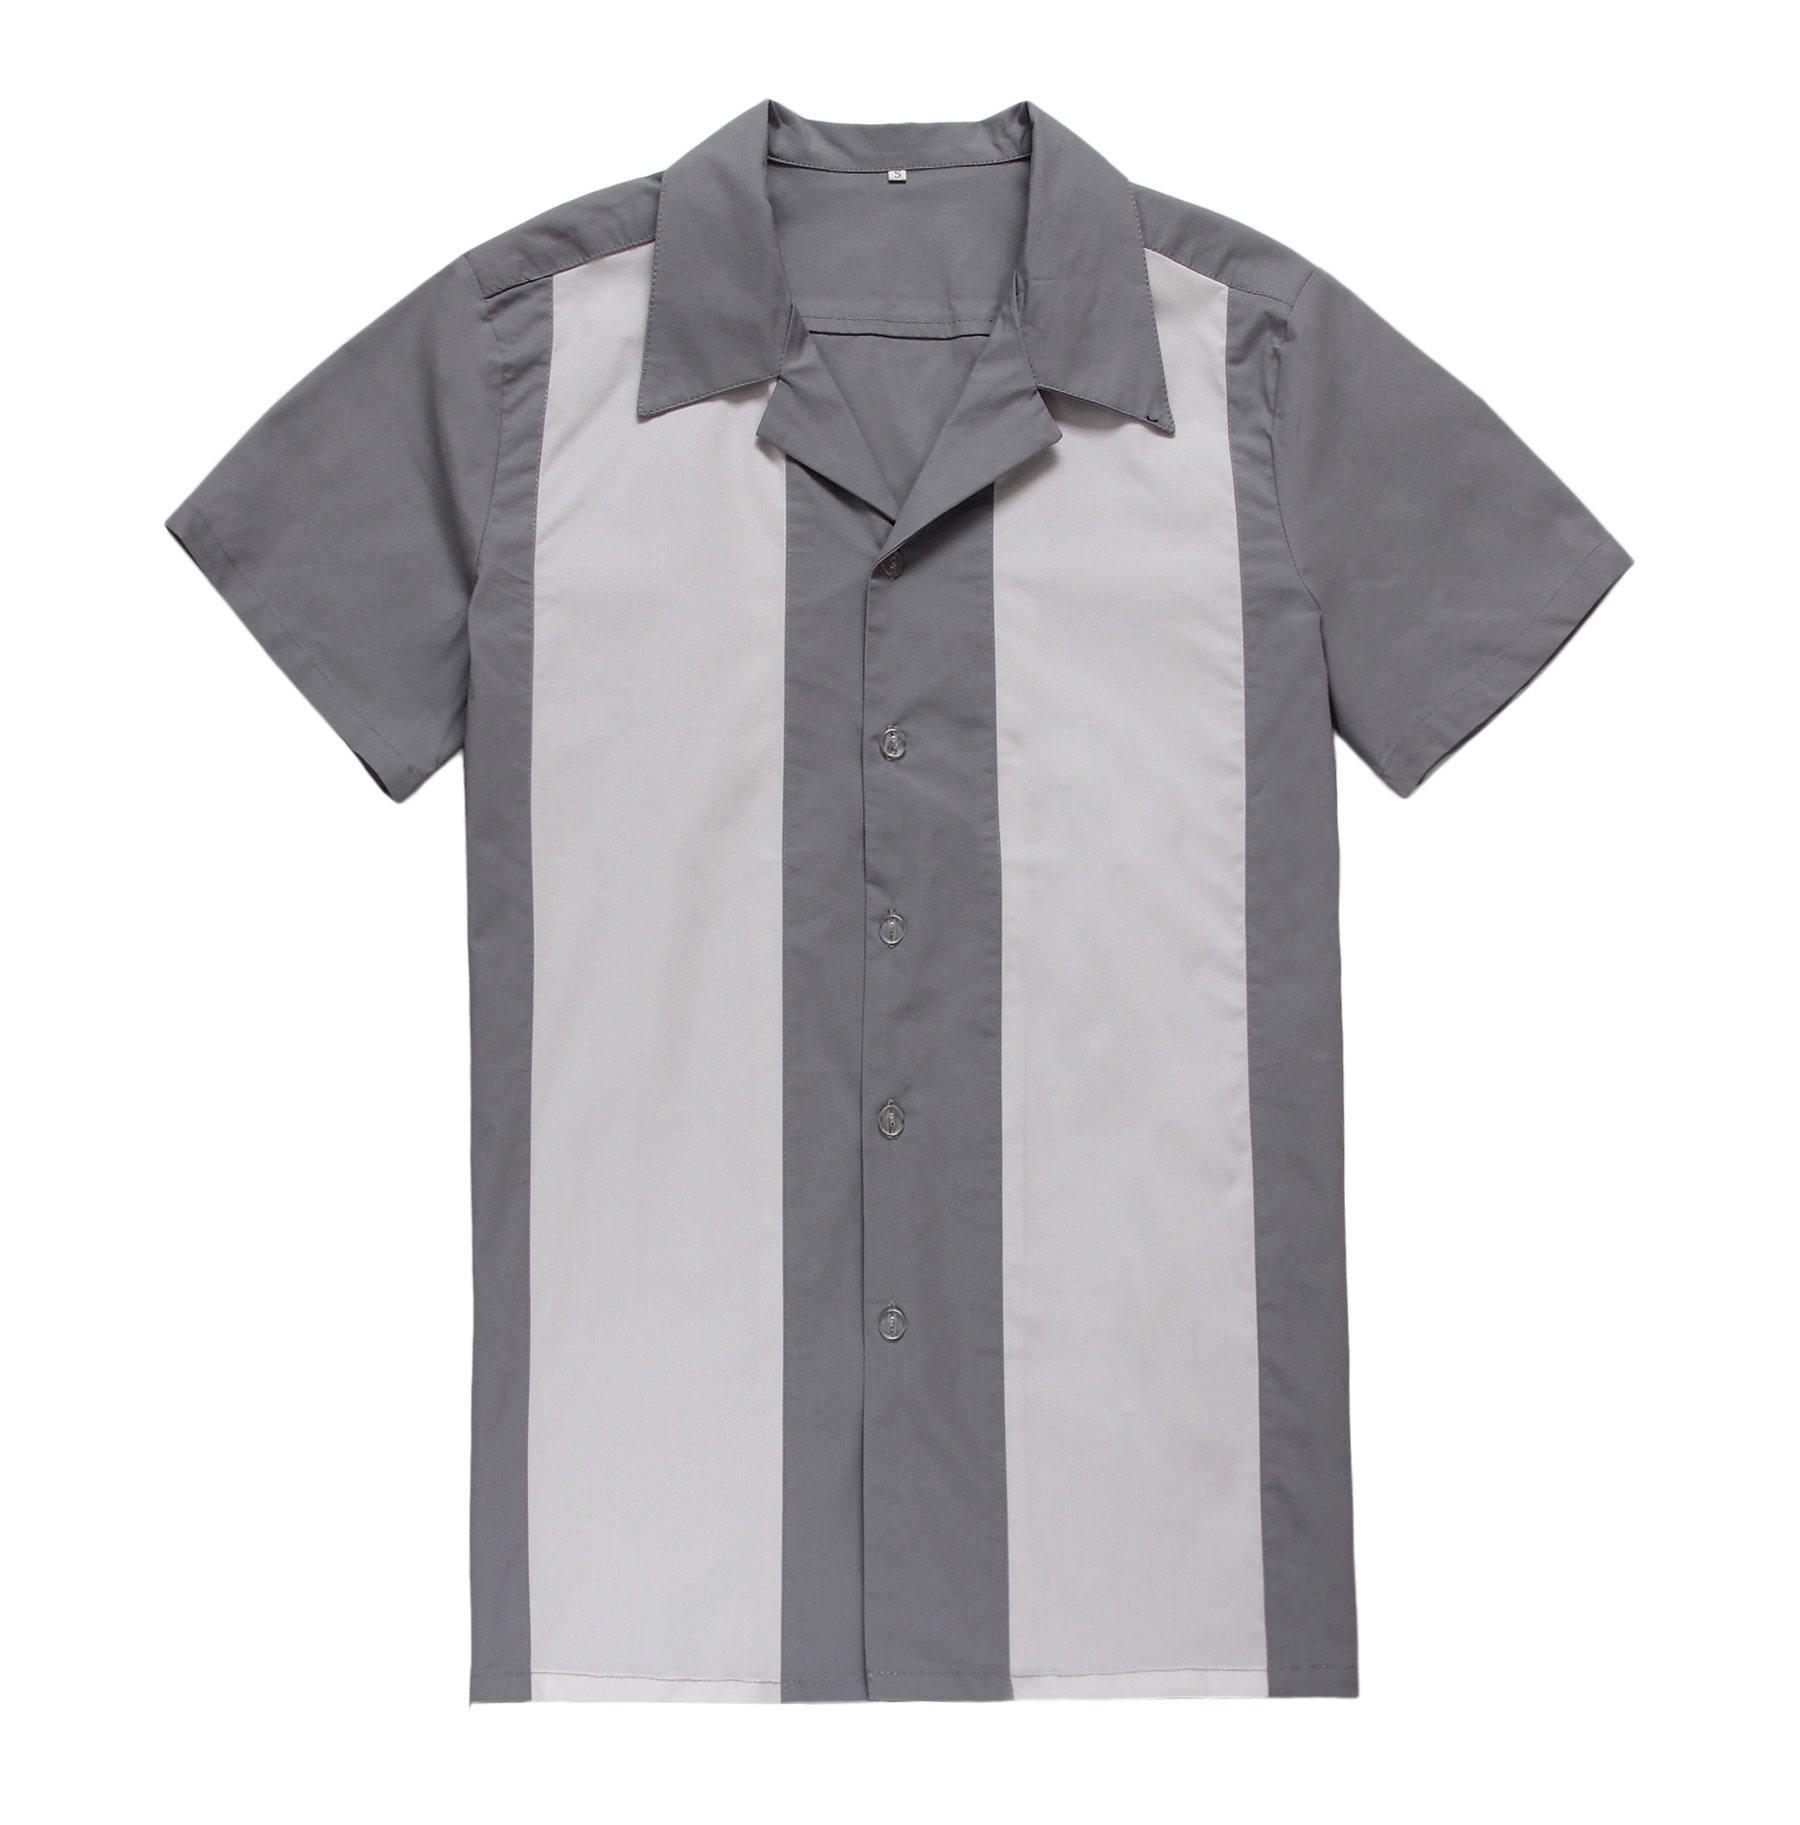 Cheap Designer Clothes For Men